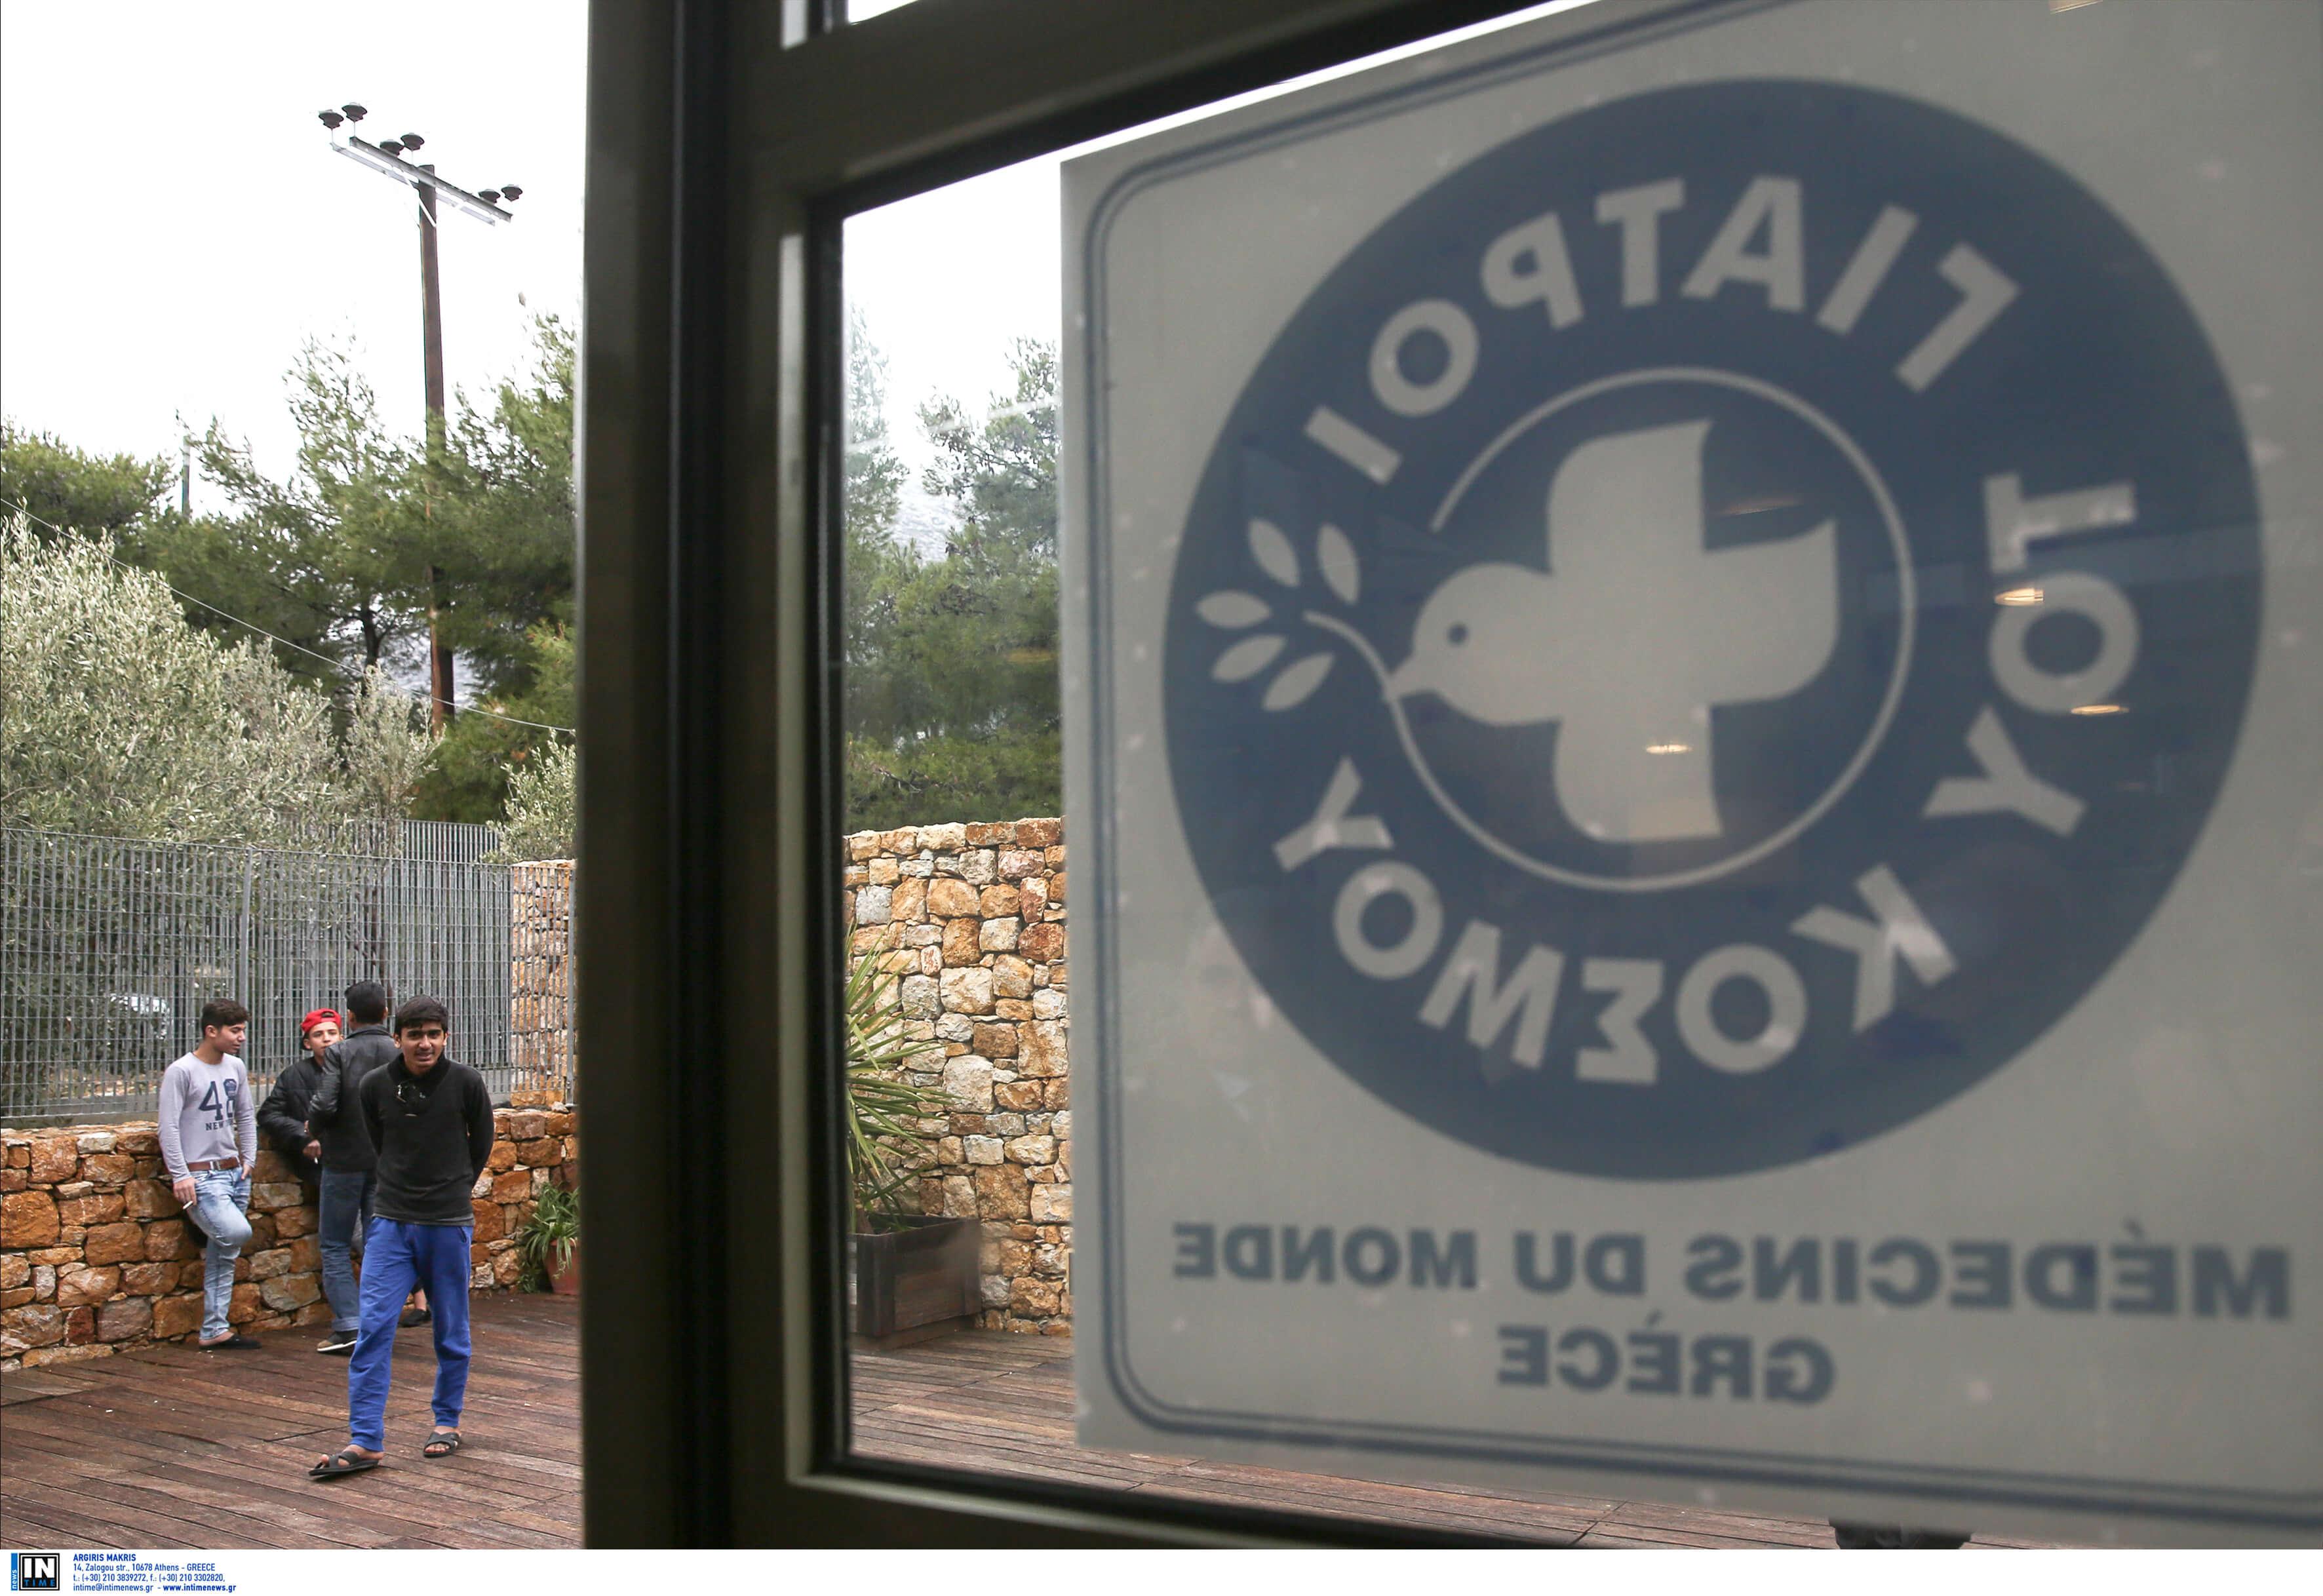 Eurostat: Πάνω από 2.600 ασυνόδευτα παιδιά ζήτησαν άσυλο στην Ελλάδα το 2018